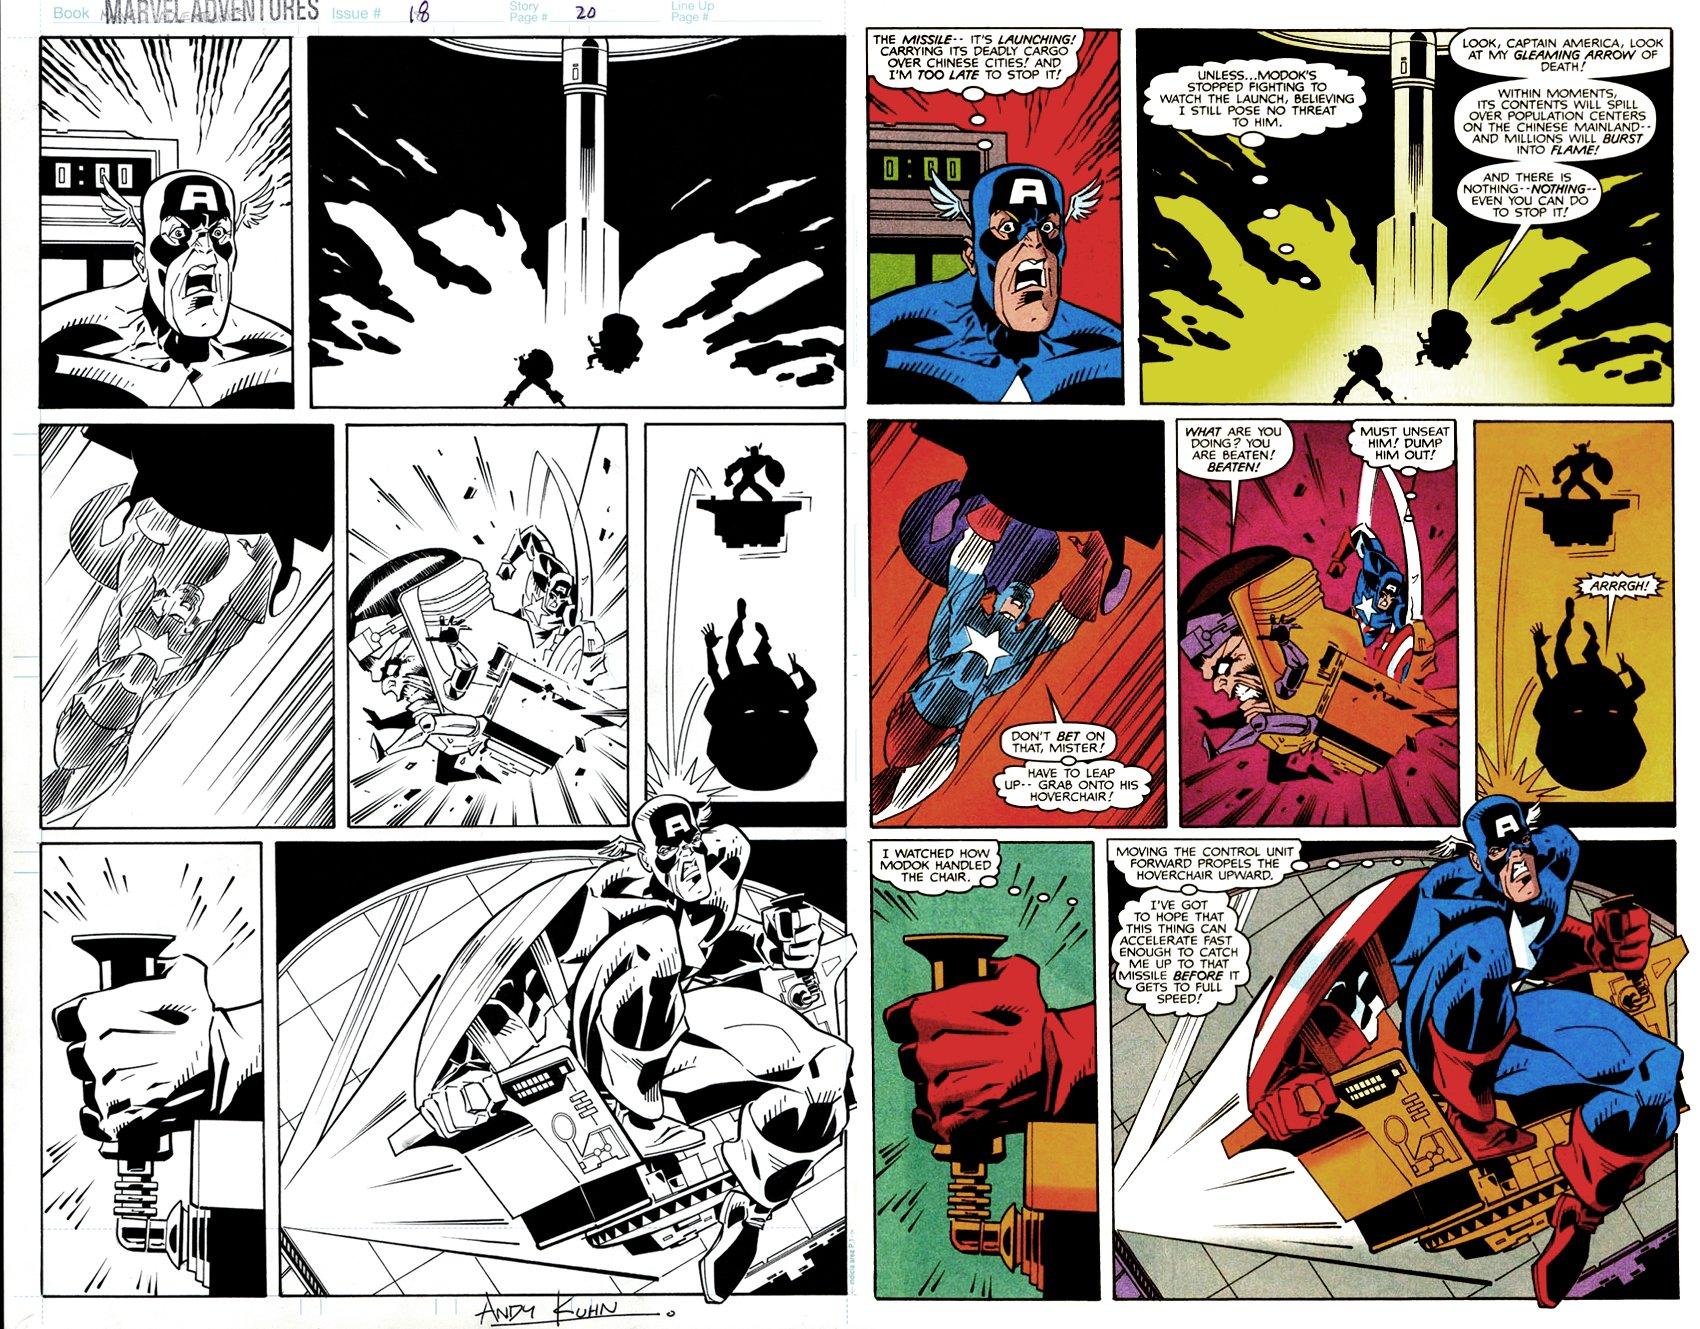 Marvel Adventures #18 p 20 (Captain America Battles THE SUPER EVIL, HORRIBLE, DASTARDLY, DESPICABLE: MOY-DOK!) 1998